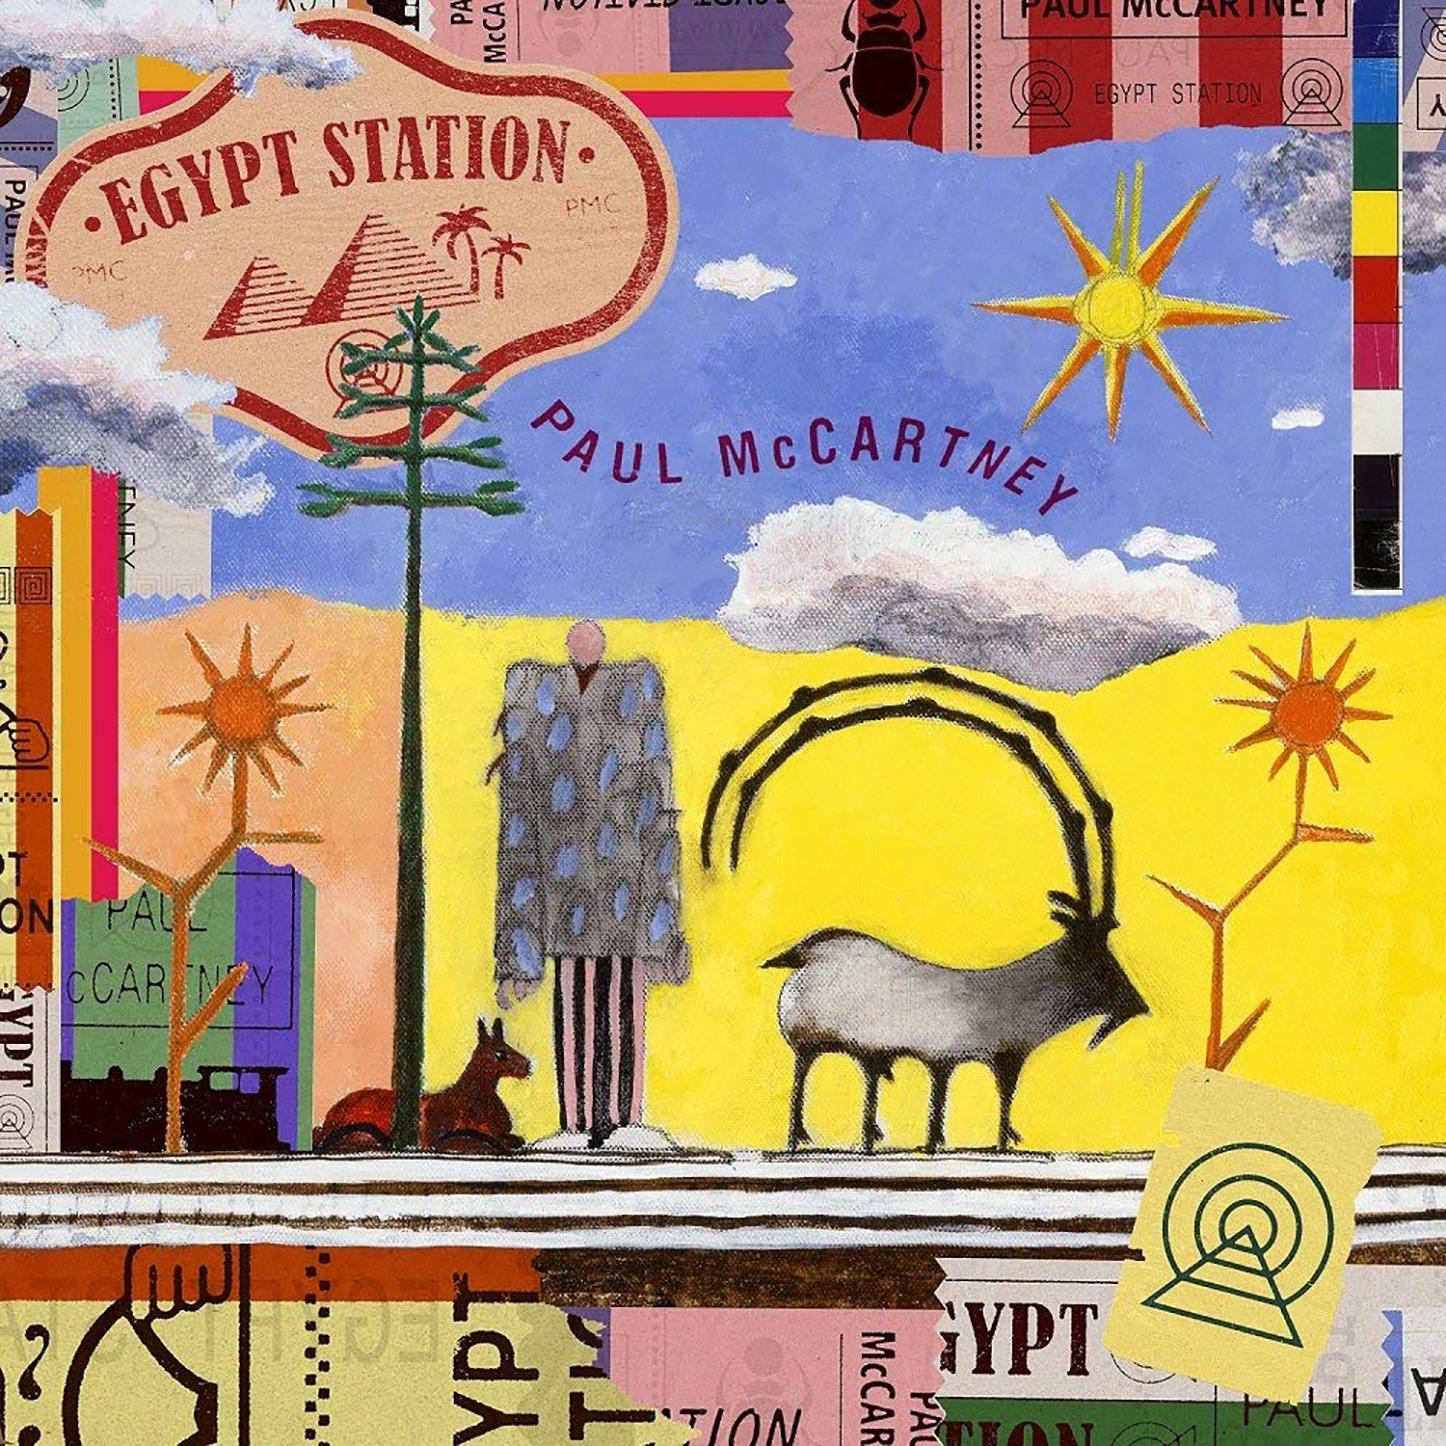 「Back In Brazil」収録アルバム『エジプト・ステーション』/Paul McCartney